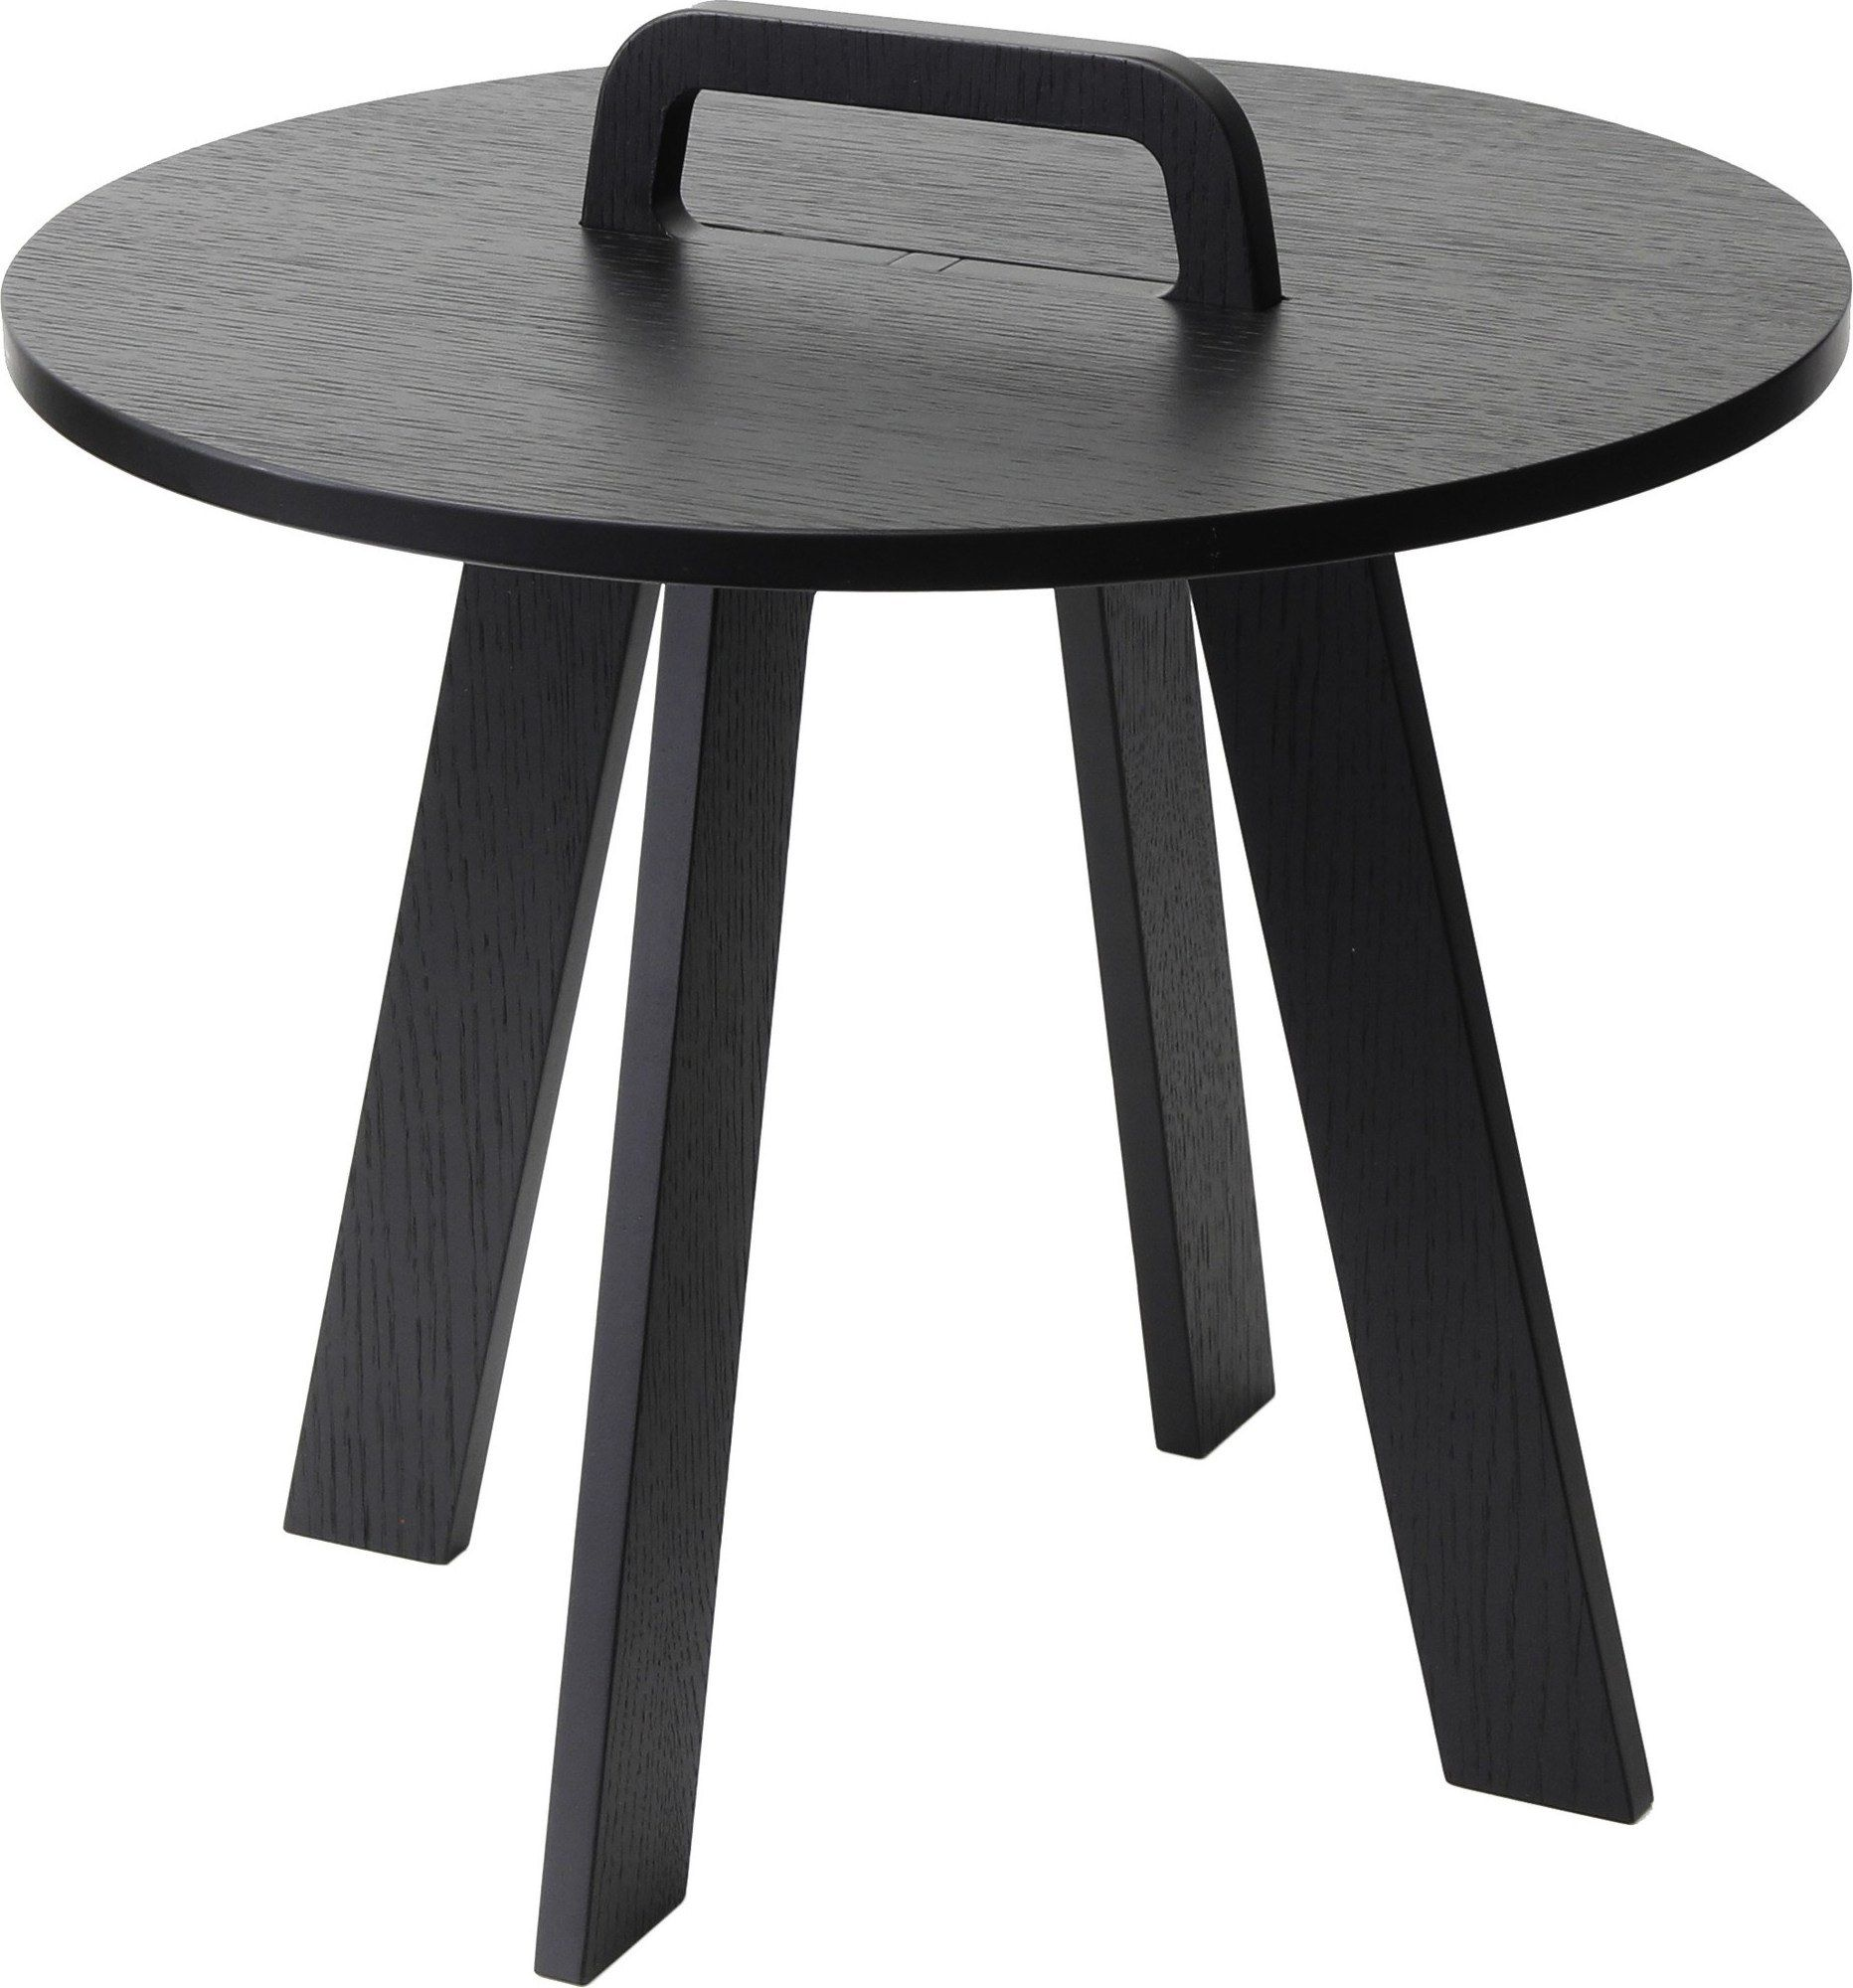 Stolik Szklany Olx Lawy Stoliki Kawowe Maly Stolik Do Kawy Stoliki Kawowe Szklane Allegro Bialy Stolik Kawowy Agata Meb Side Table Home Decor Furniture